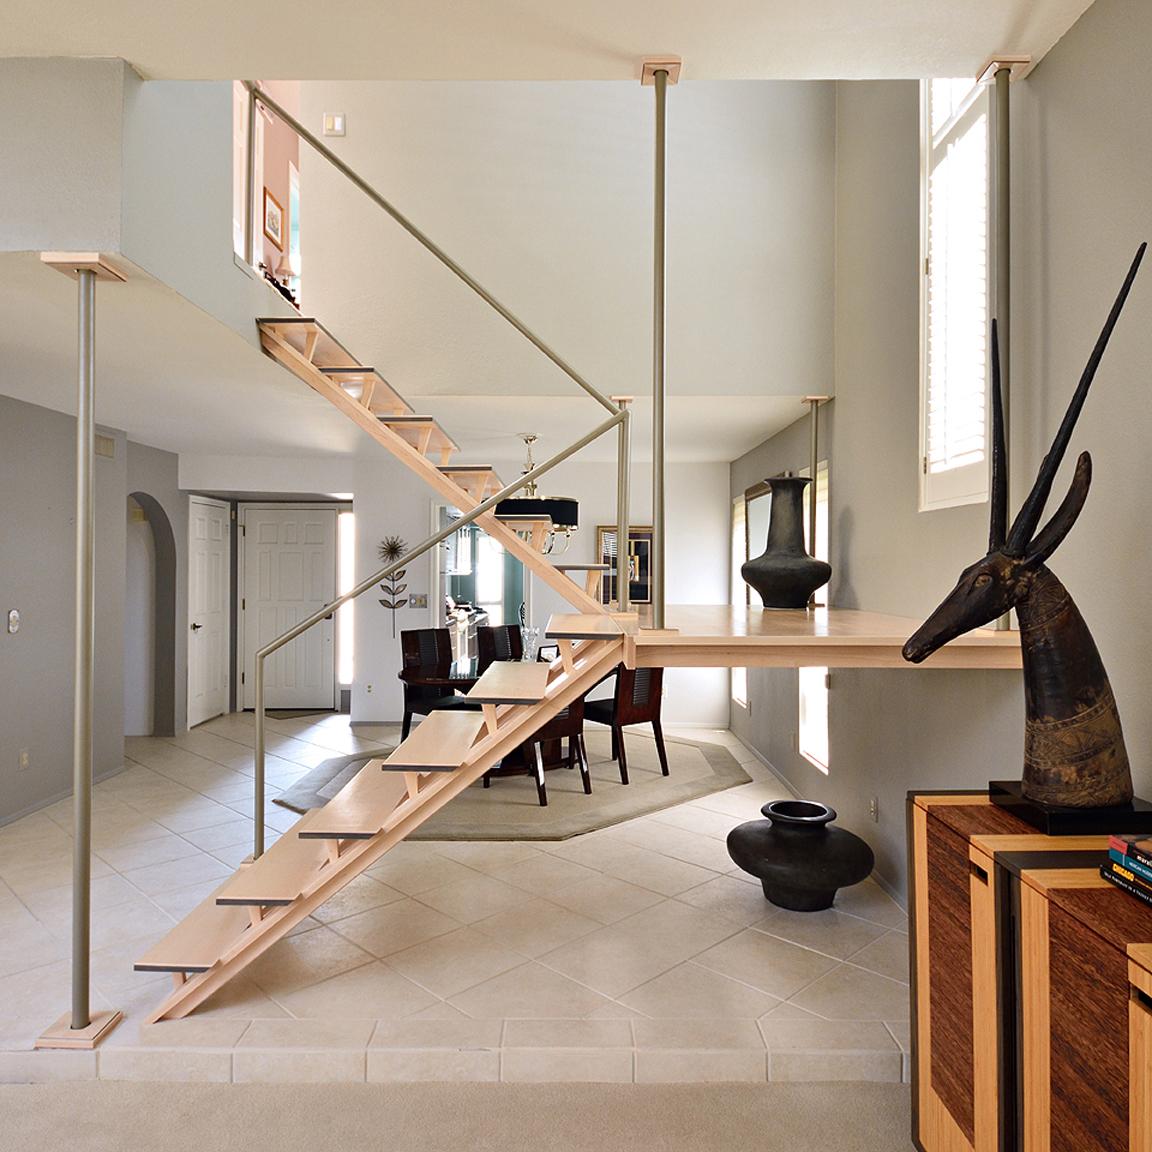 Custom modern stairways by paul rene furniture and cabinets phoenix scottsdale az